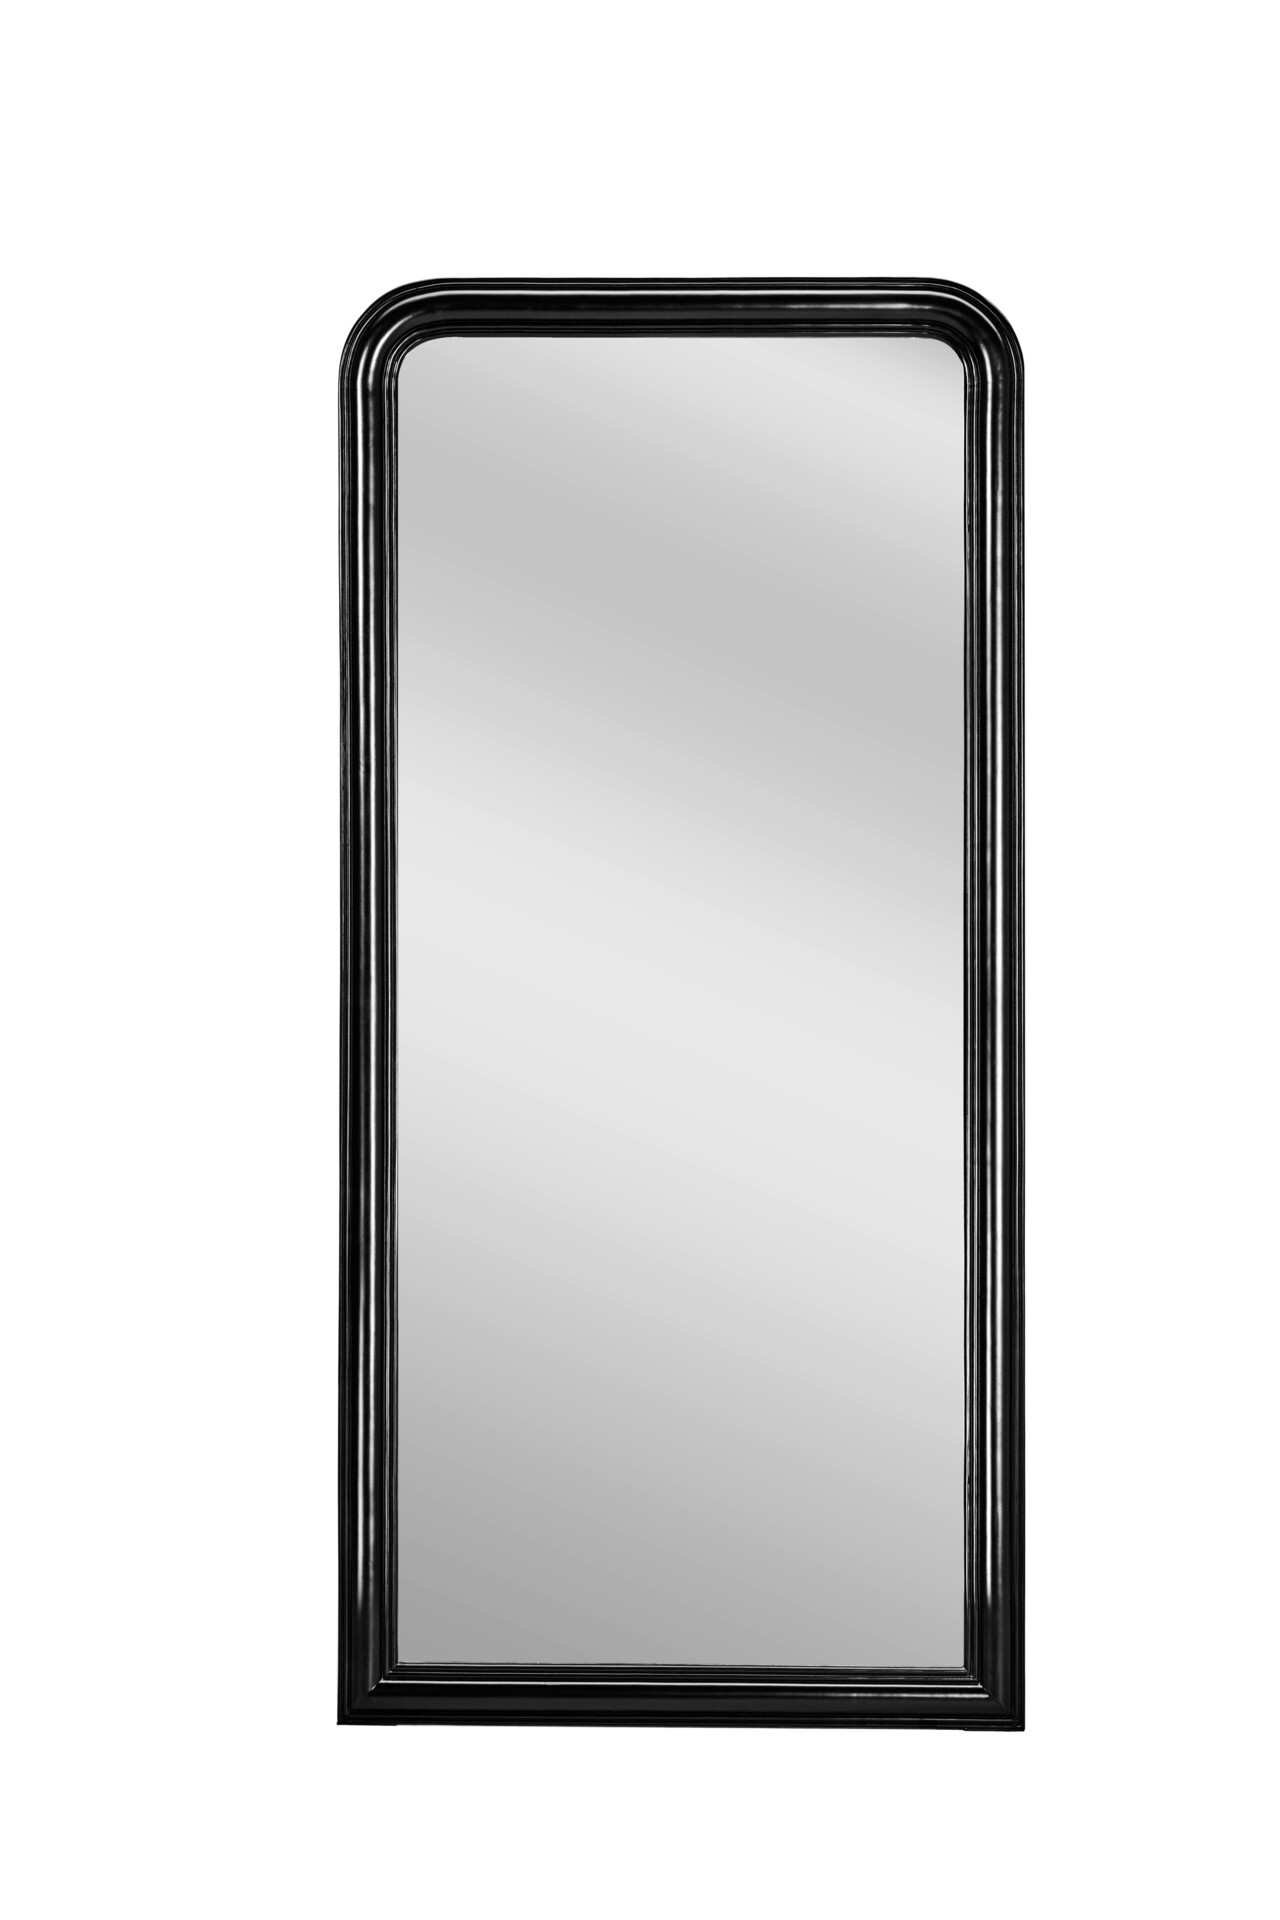 svart spegel